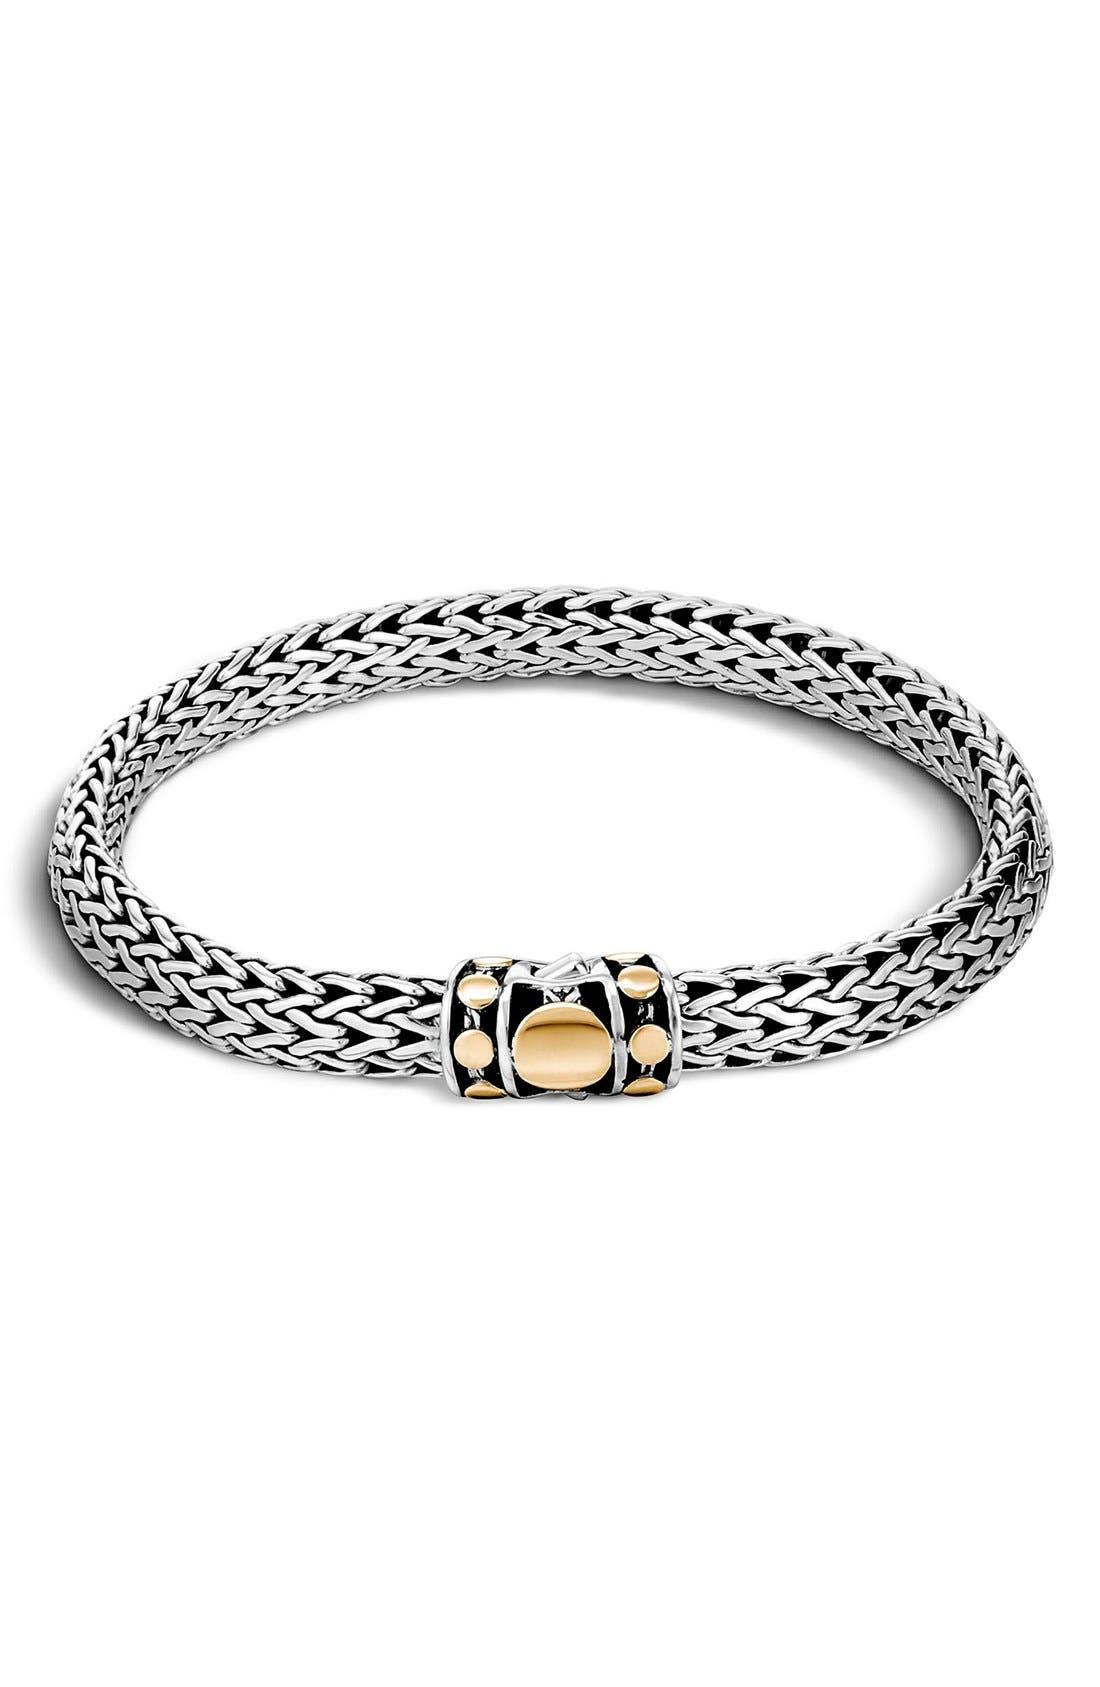 Main Image - John Hardy 'Dot' Gold & Silver Chain Bracelet